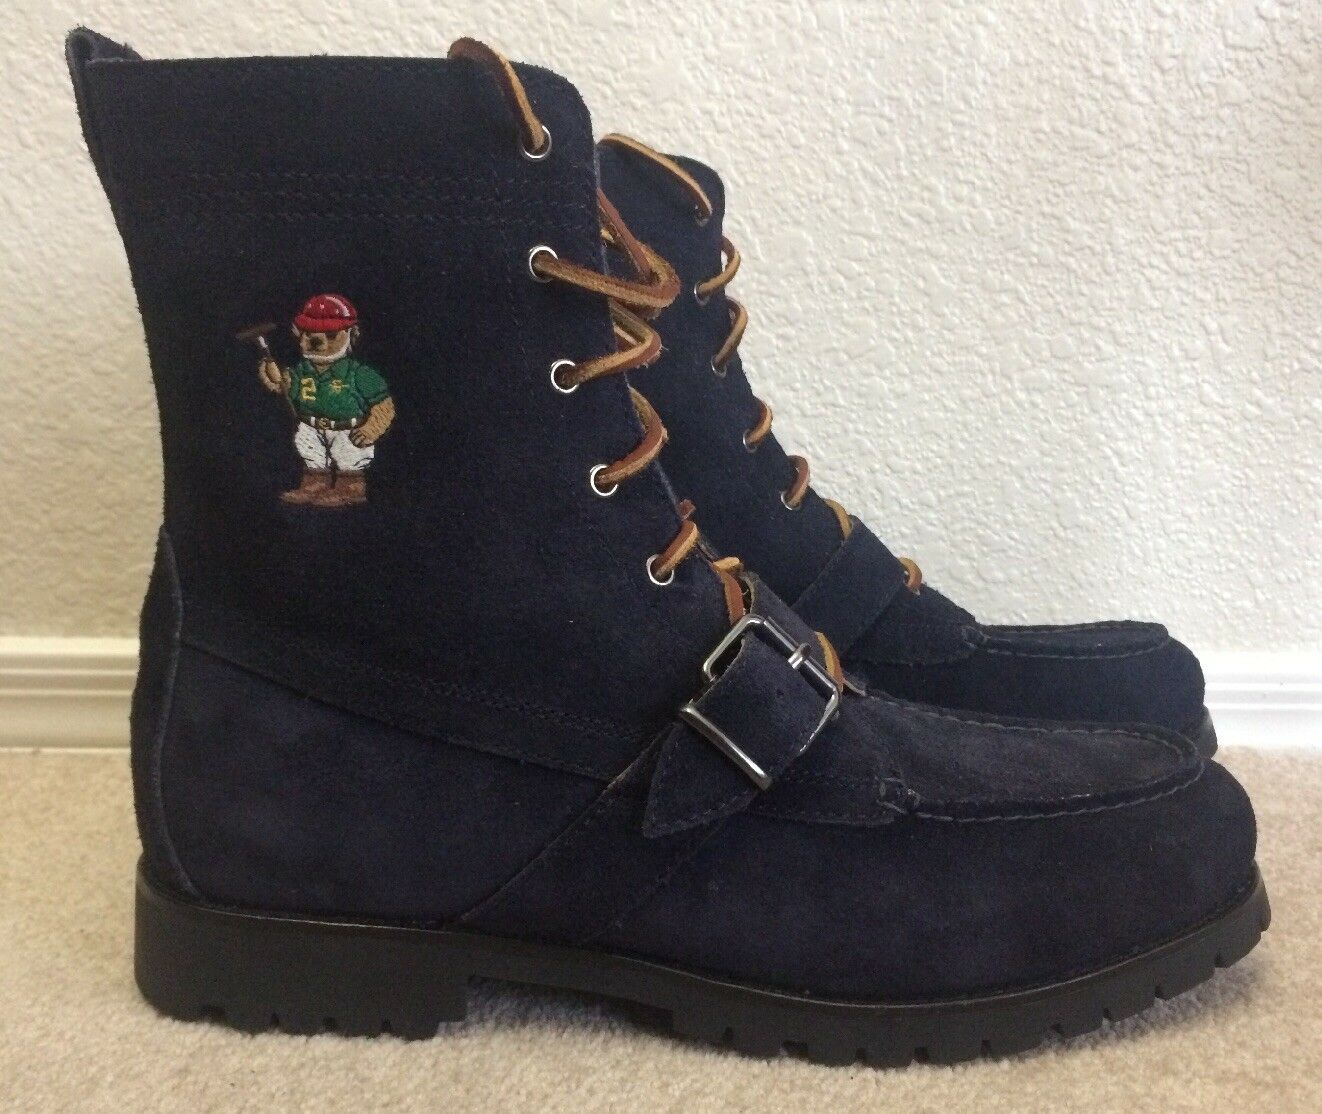 Polo Ralph Lauren boot mens Sz 11 bluee Suede Bear Ranger B II Moccasin Lug Sole